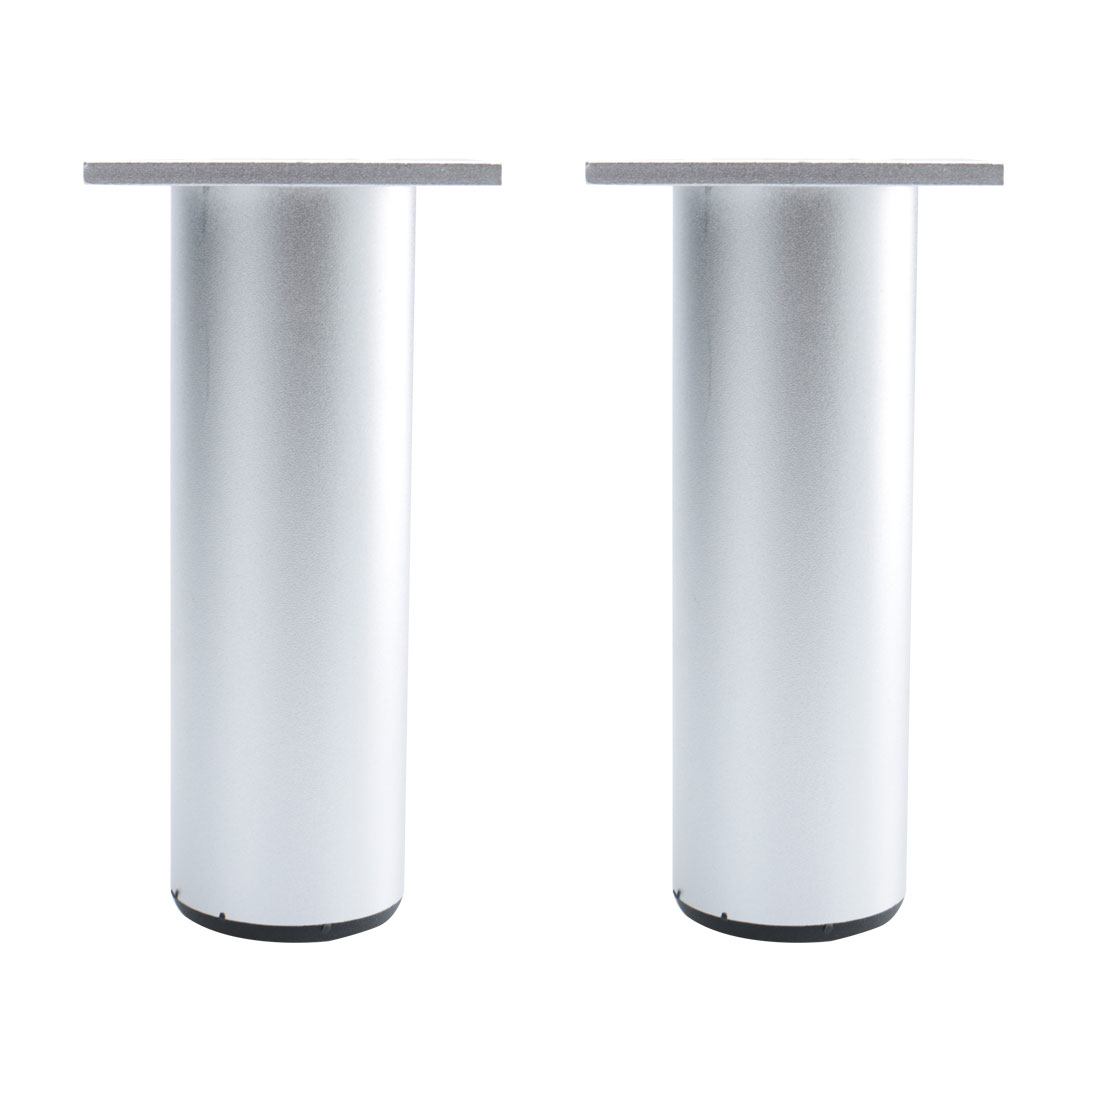 "5"" Furniture Legs Aluminium Alloy Sofa Table Replacement Height Adjuster 2pcs"